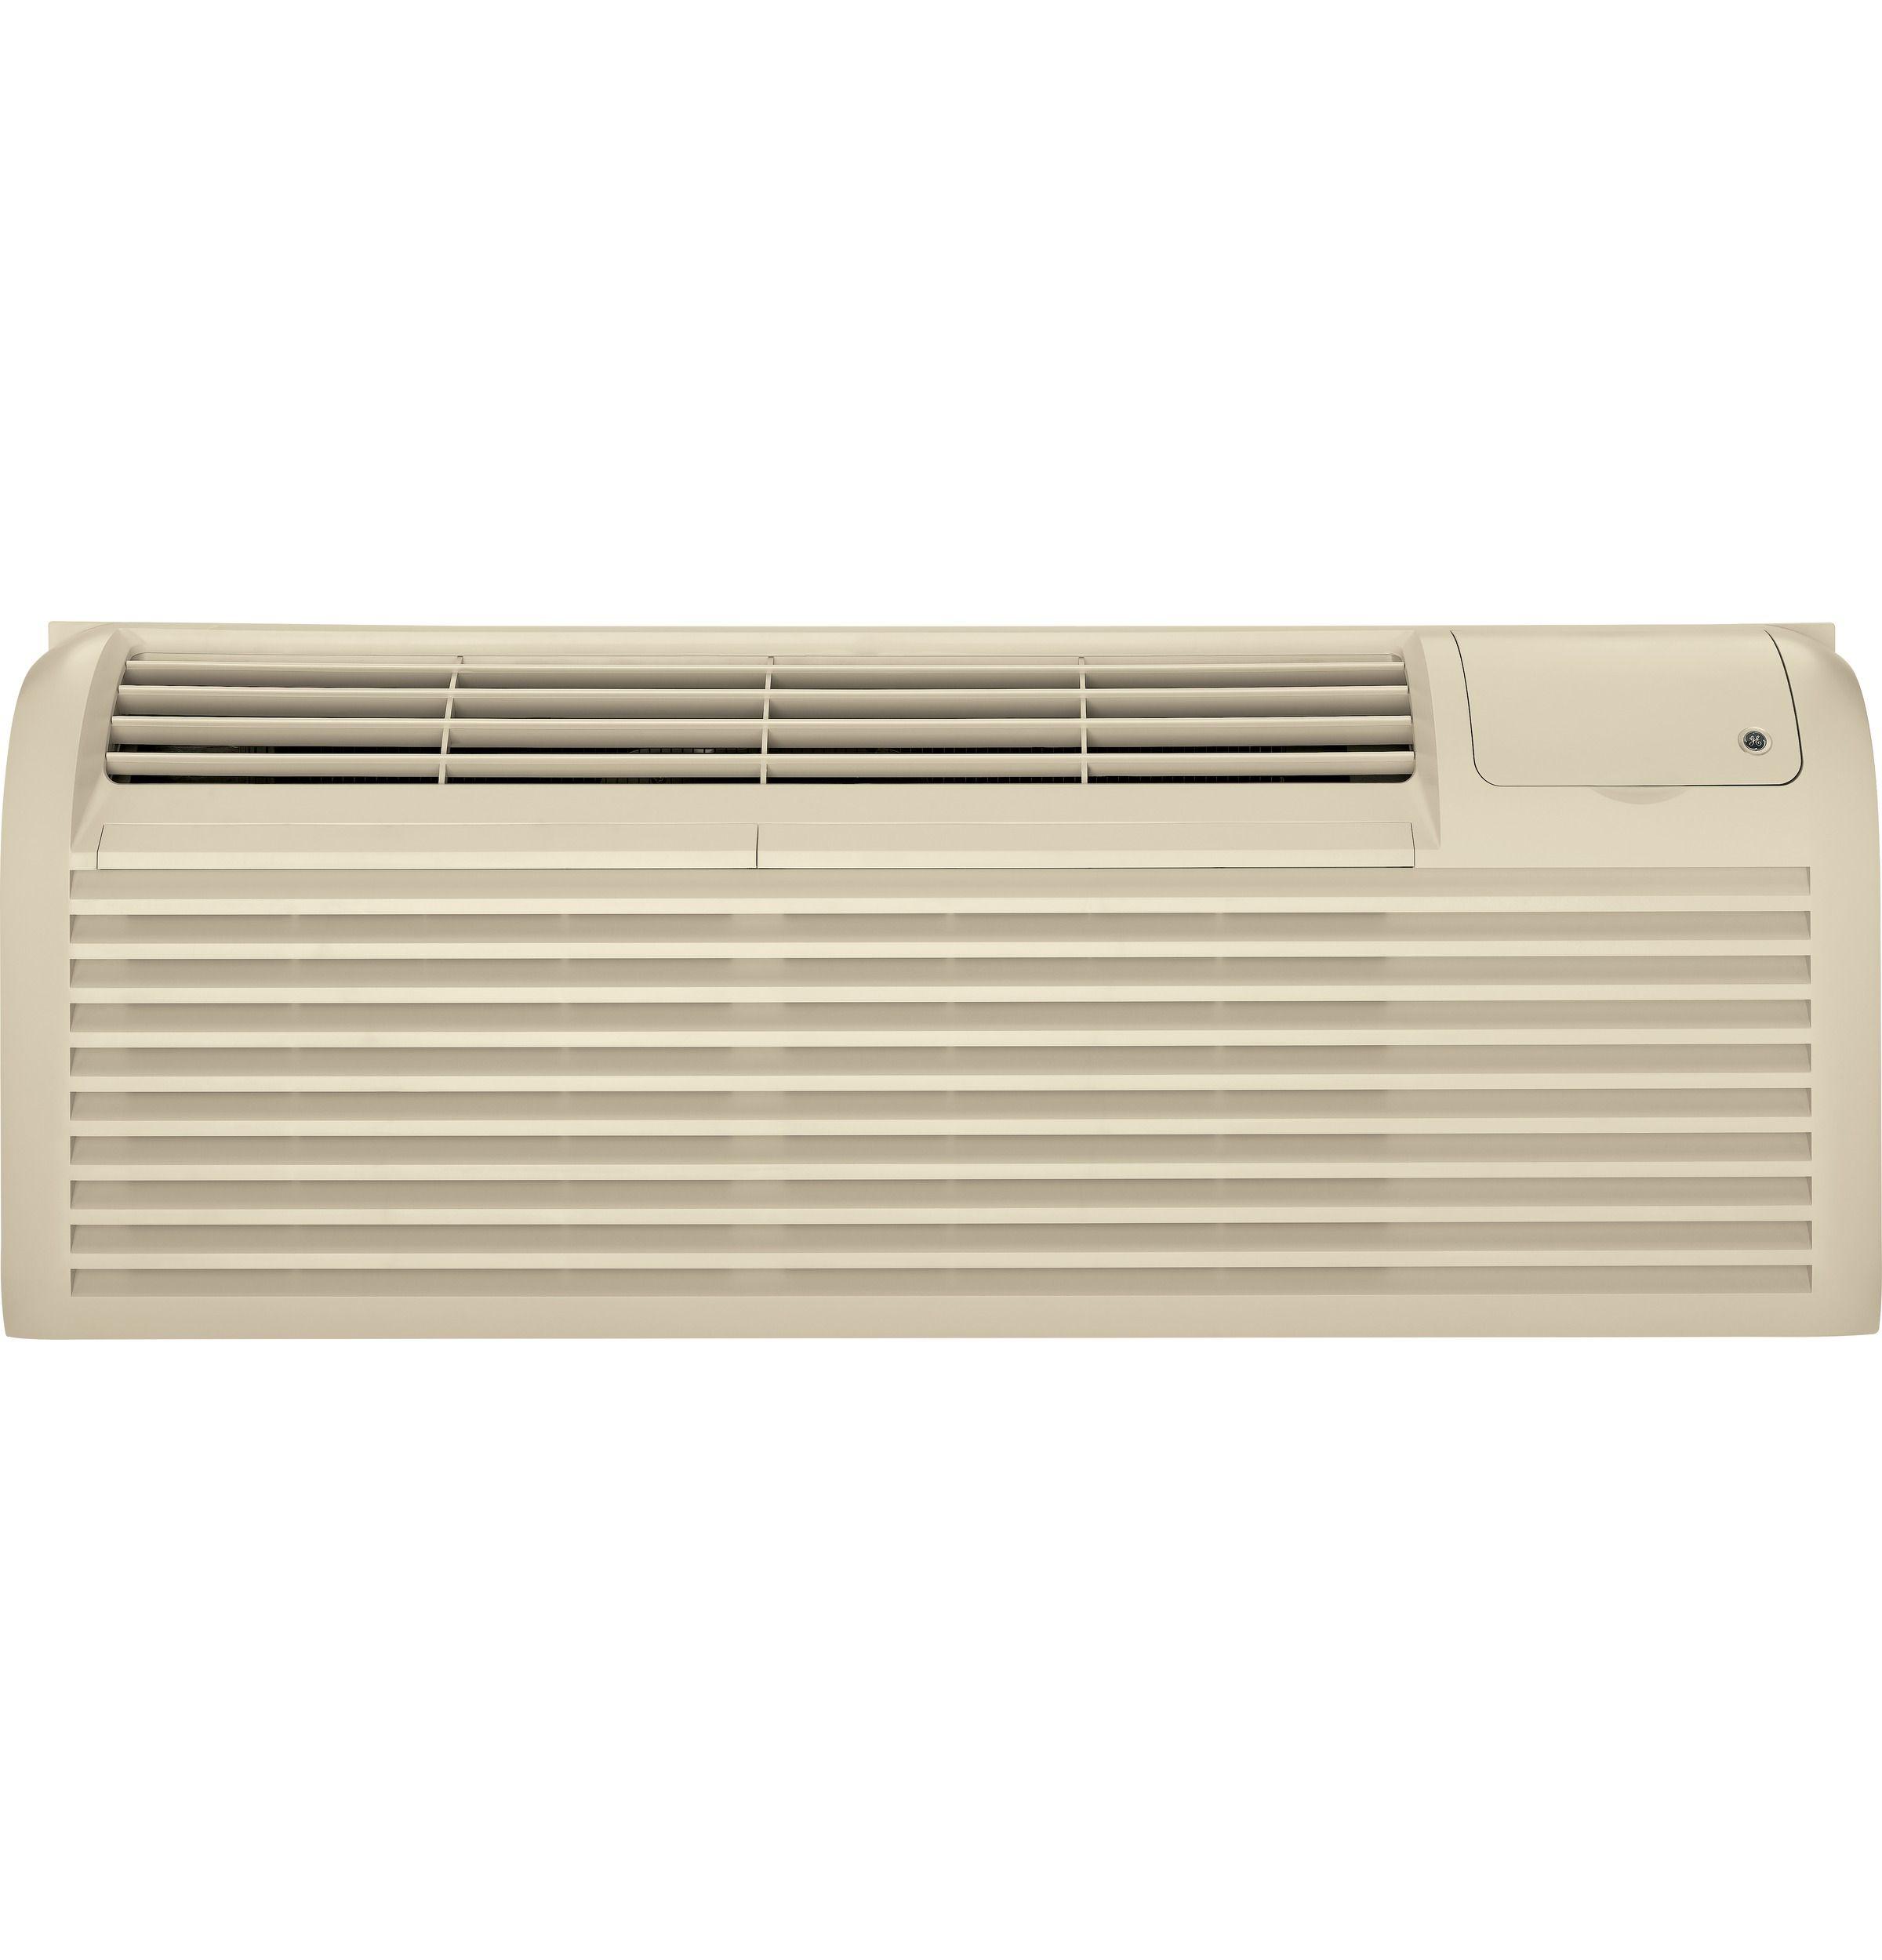 GE Zoneline® Deluxe Series Heat Pump Unit^AZ39H12DAB